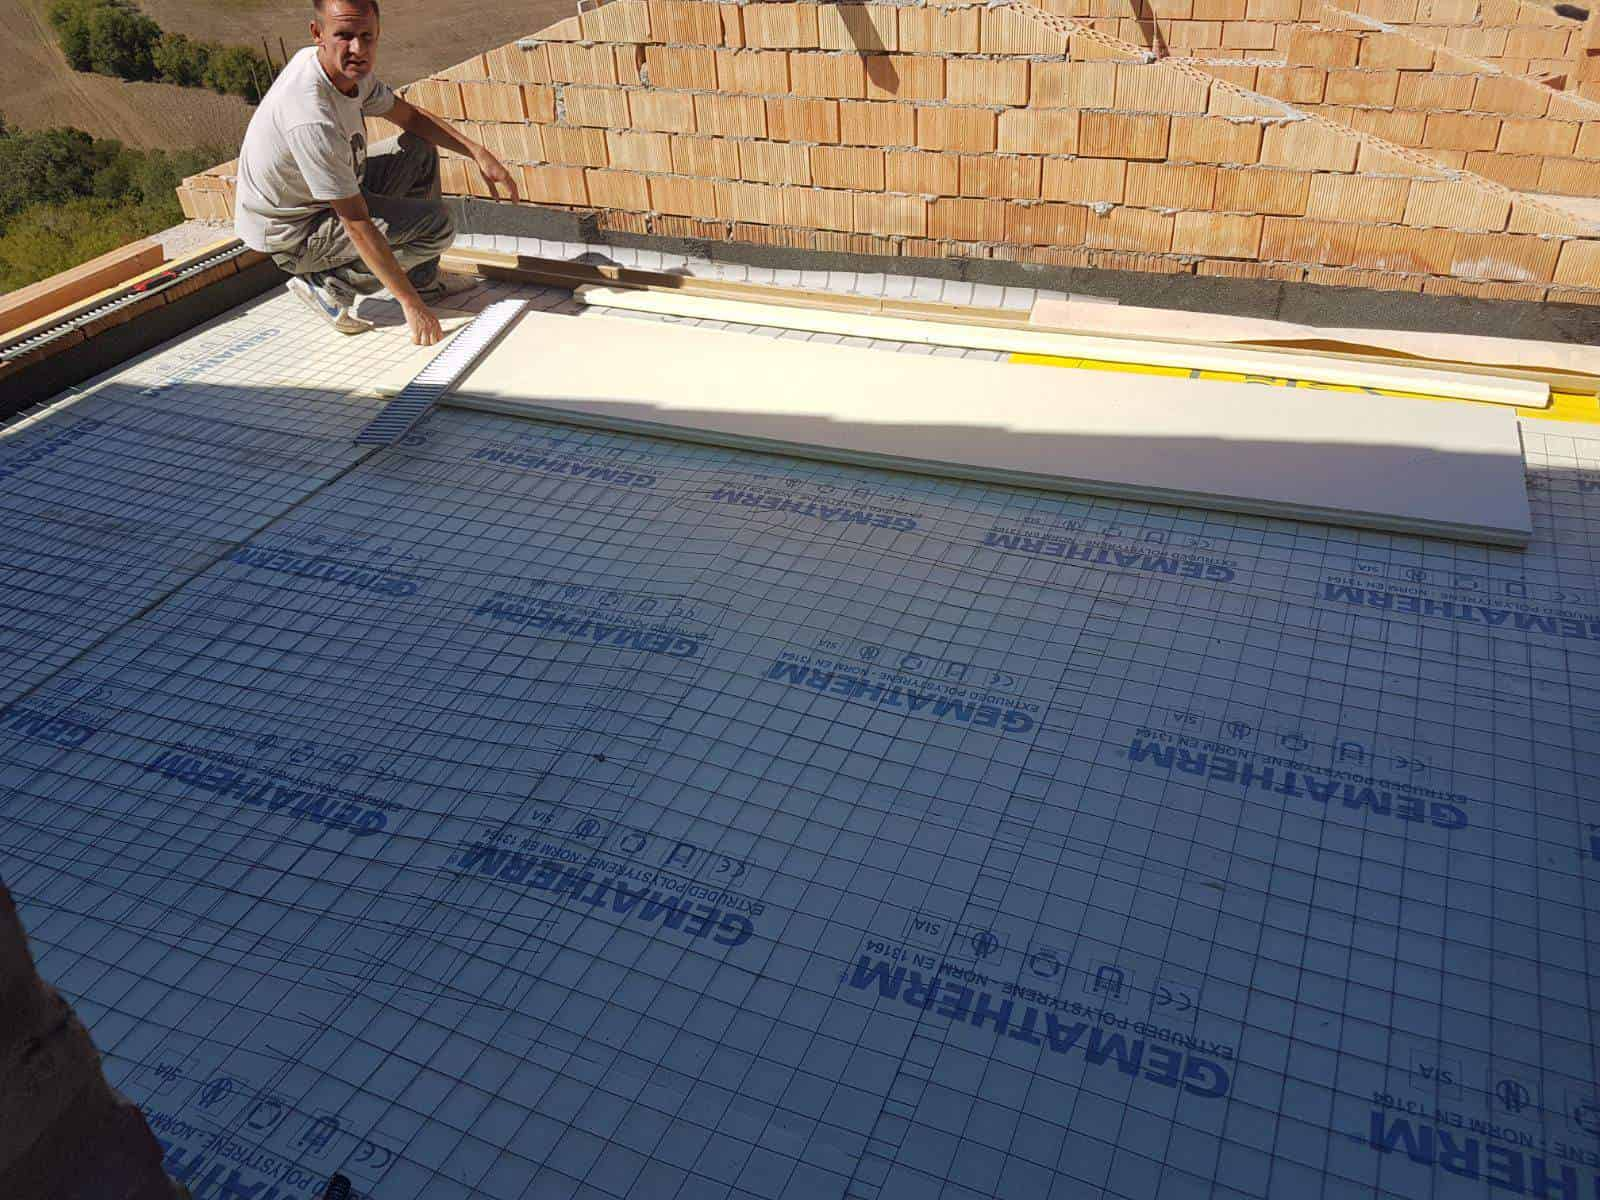 Terrazza Floor Ready for Concrete